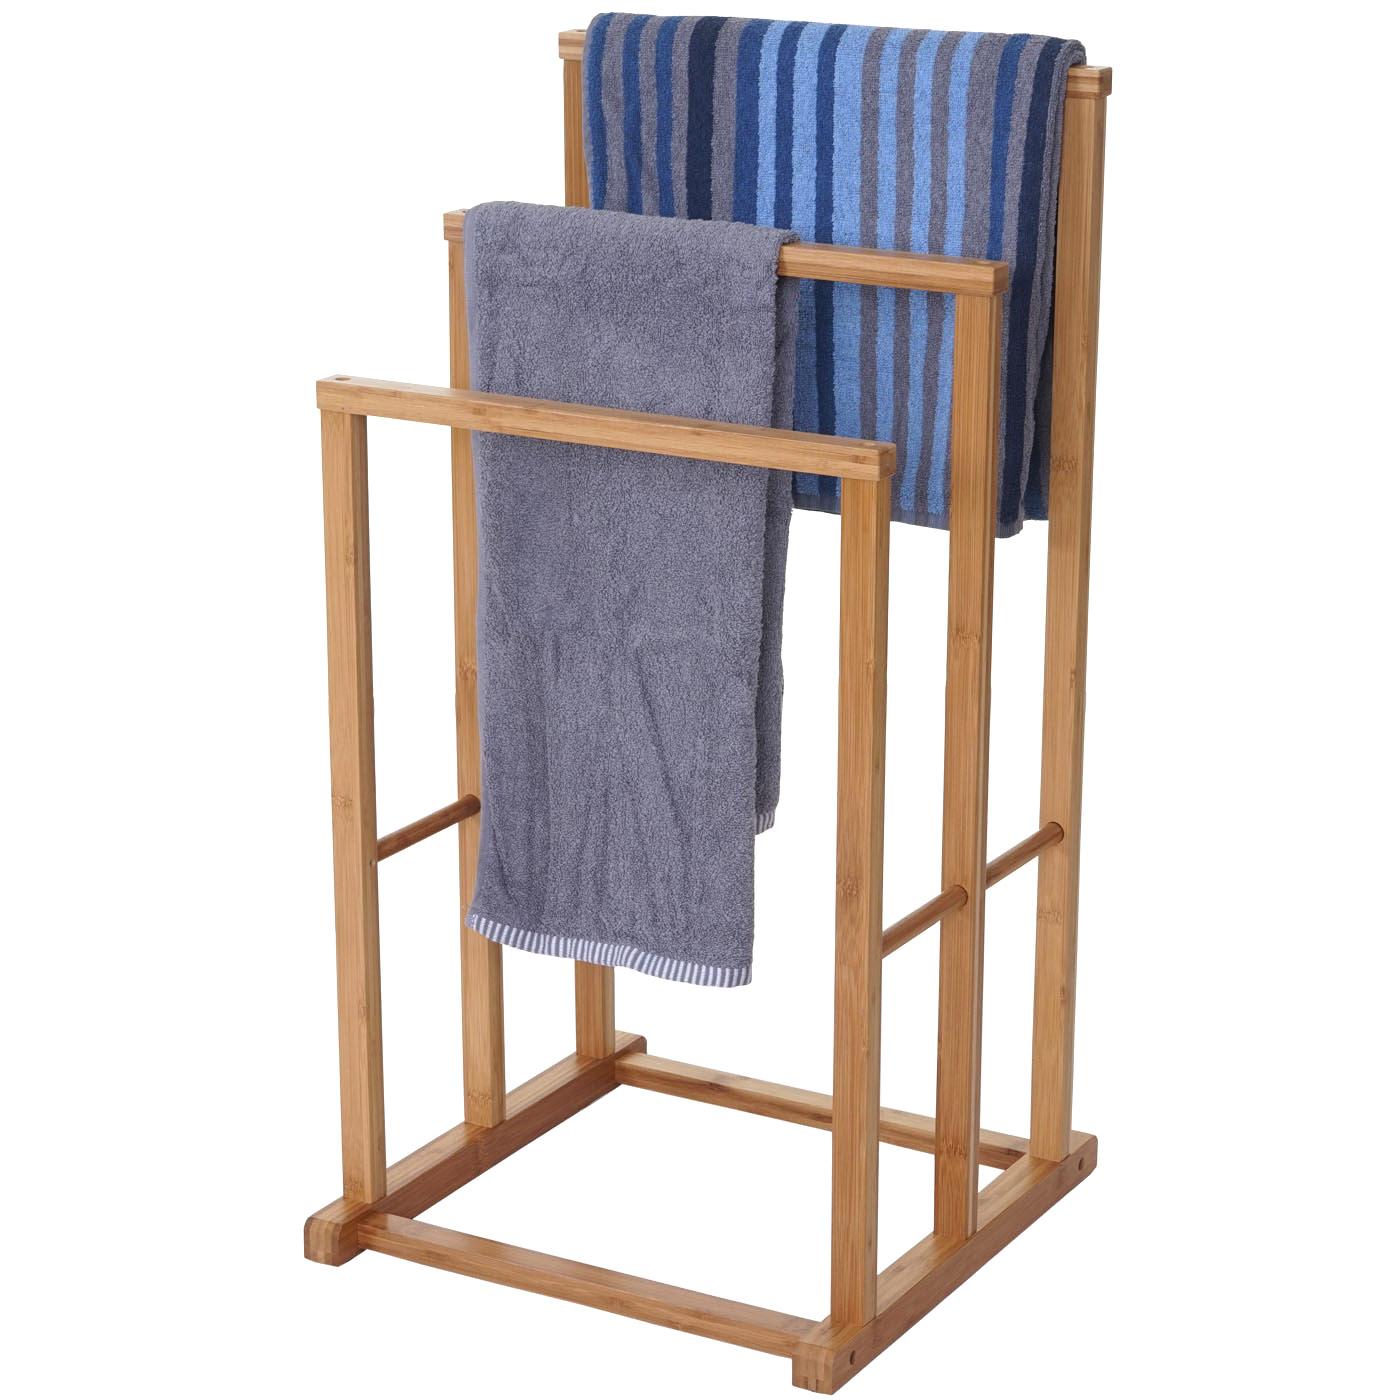 handtuchhalter hwc b18 badezimmer handtuchst nder. Black Bedroom Furniture Sets. Home Design Ideas